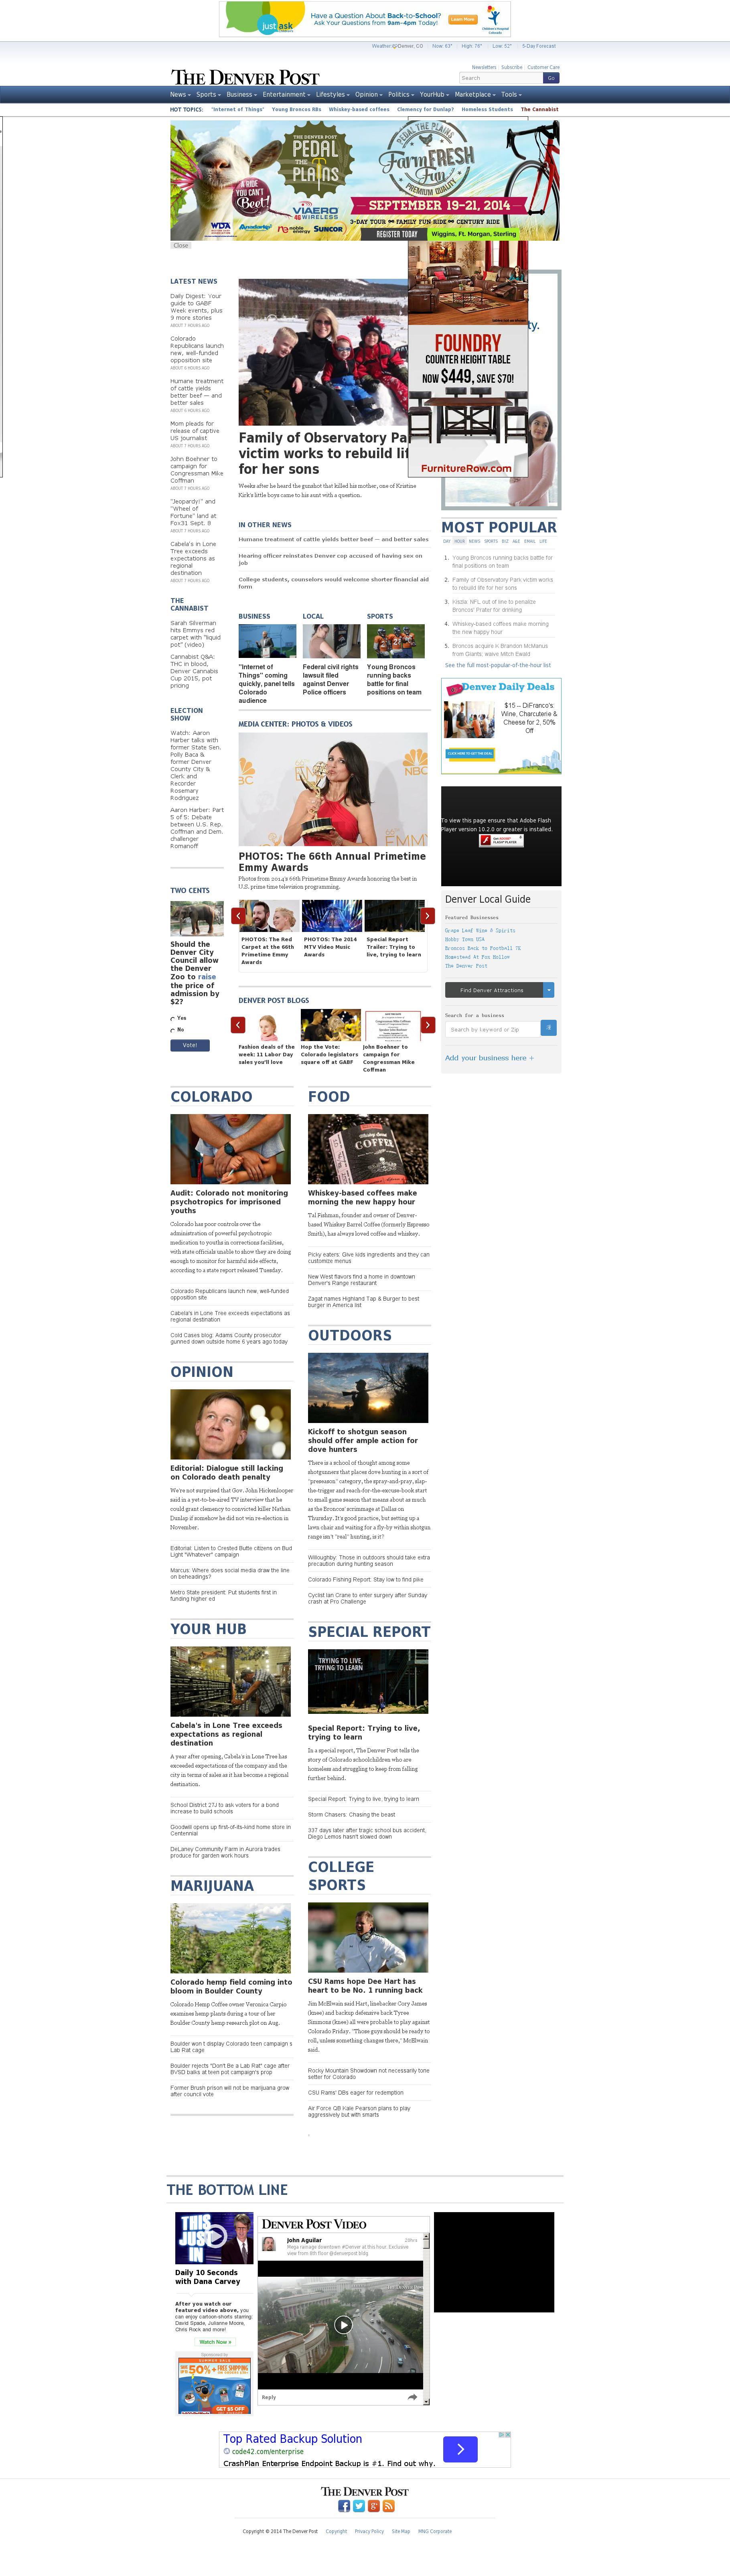 Denver Post at Wednesday Aug. 27, 2014, 5:03 p.m. UTC